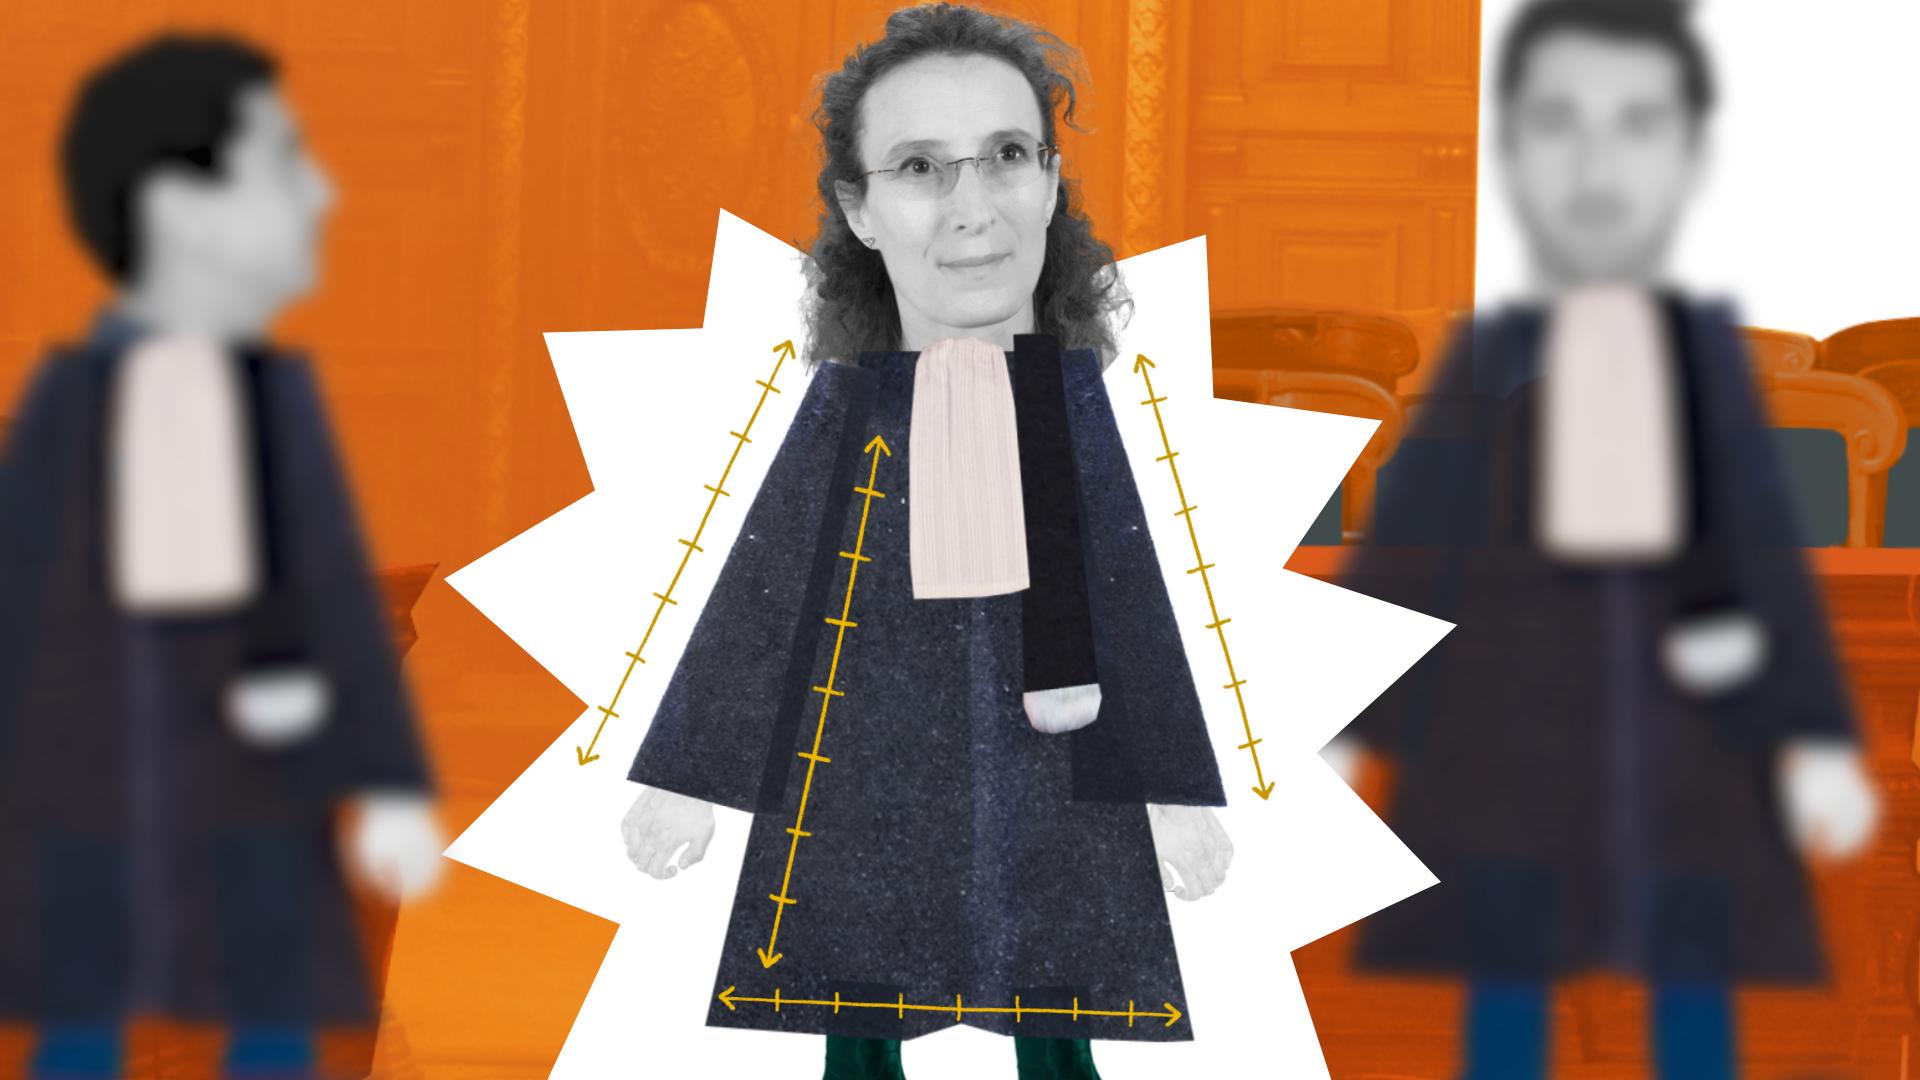 La robe d'avocat